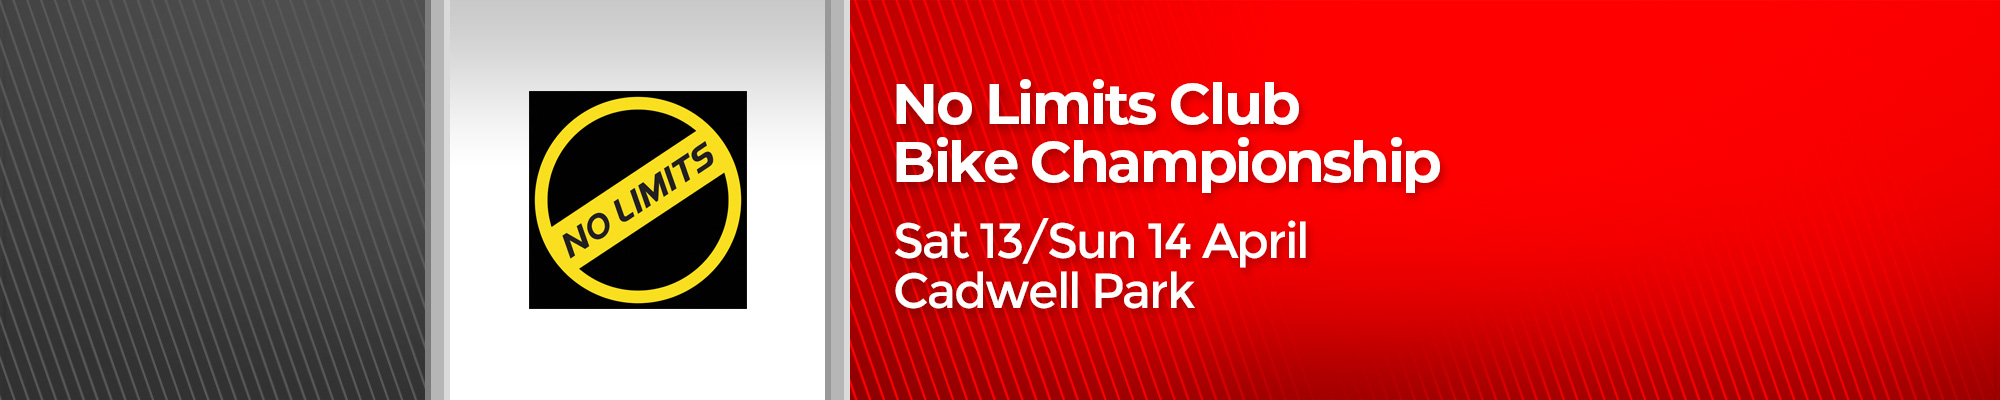 No Limits Club Bike Championships